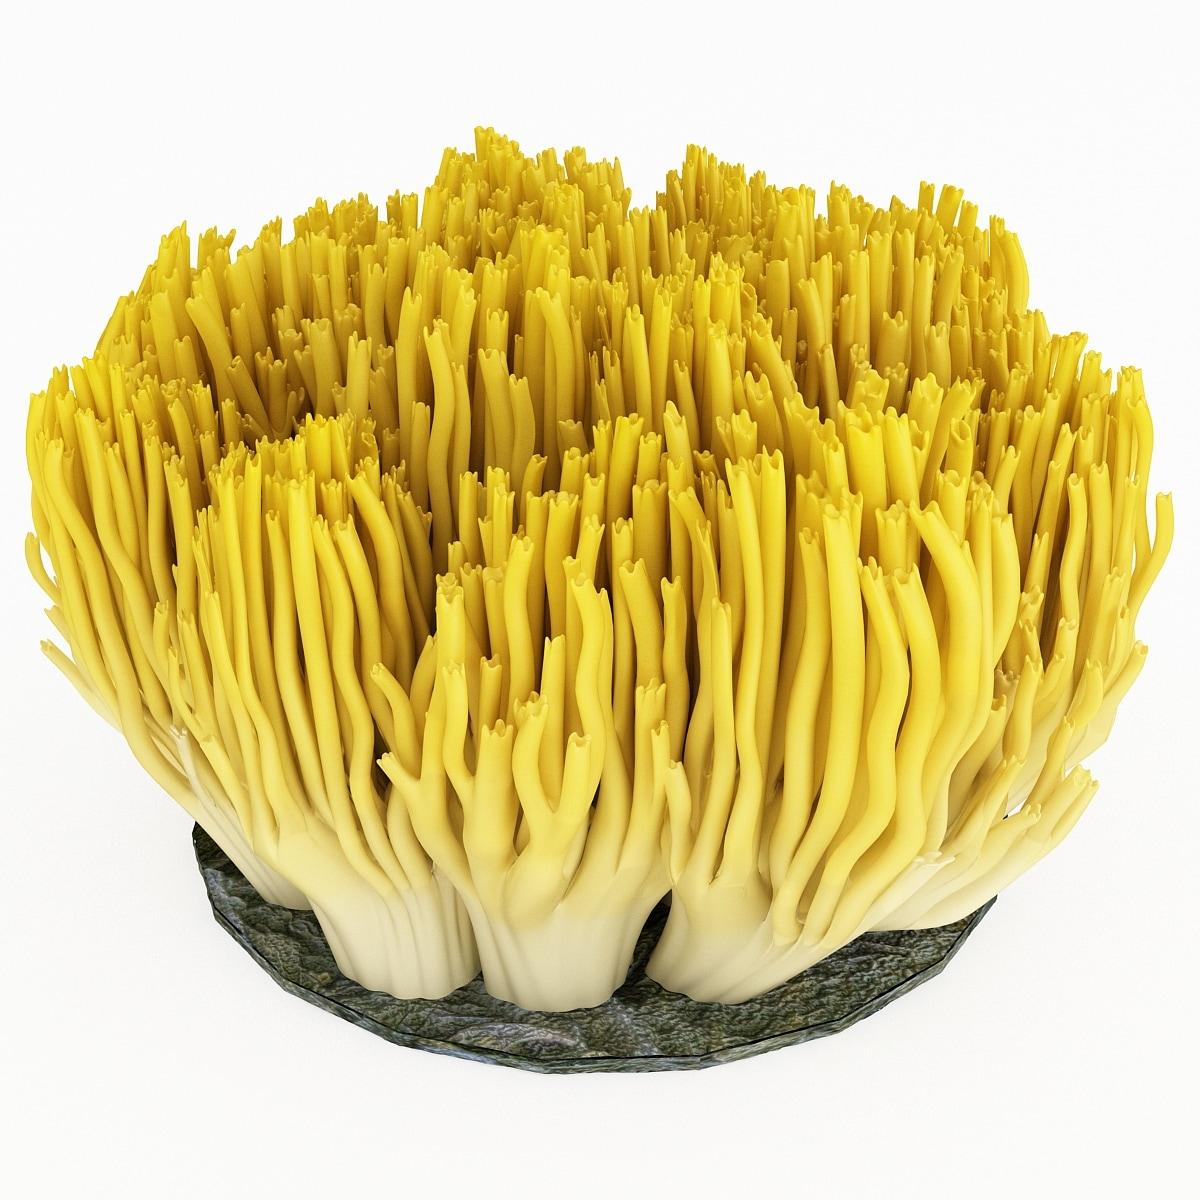 130666_Coral_Fungus_004.jpg